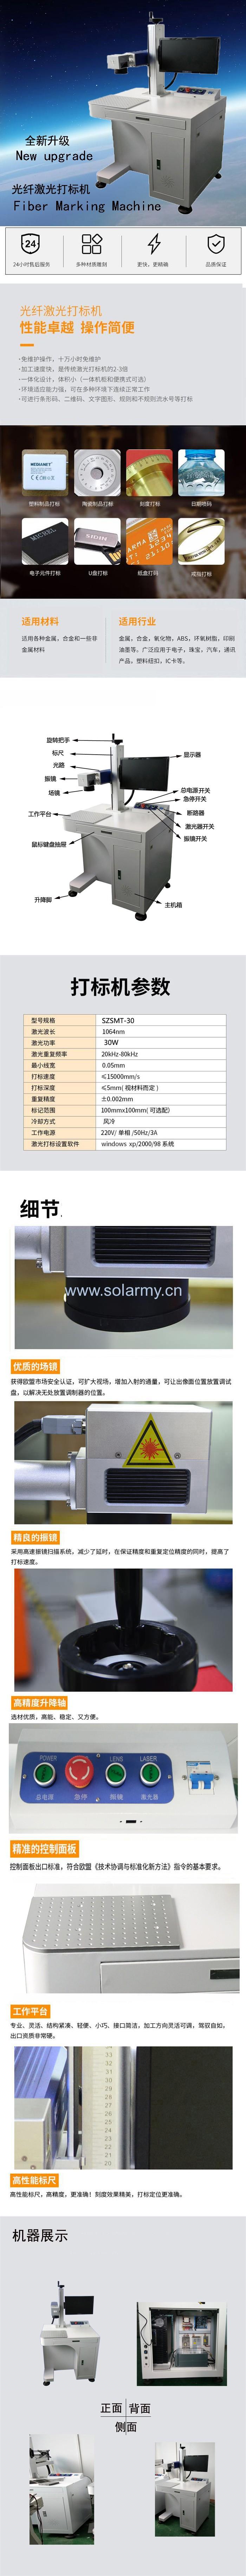 30W标准机光纤中文.jpg